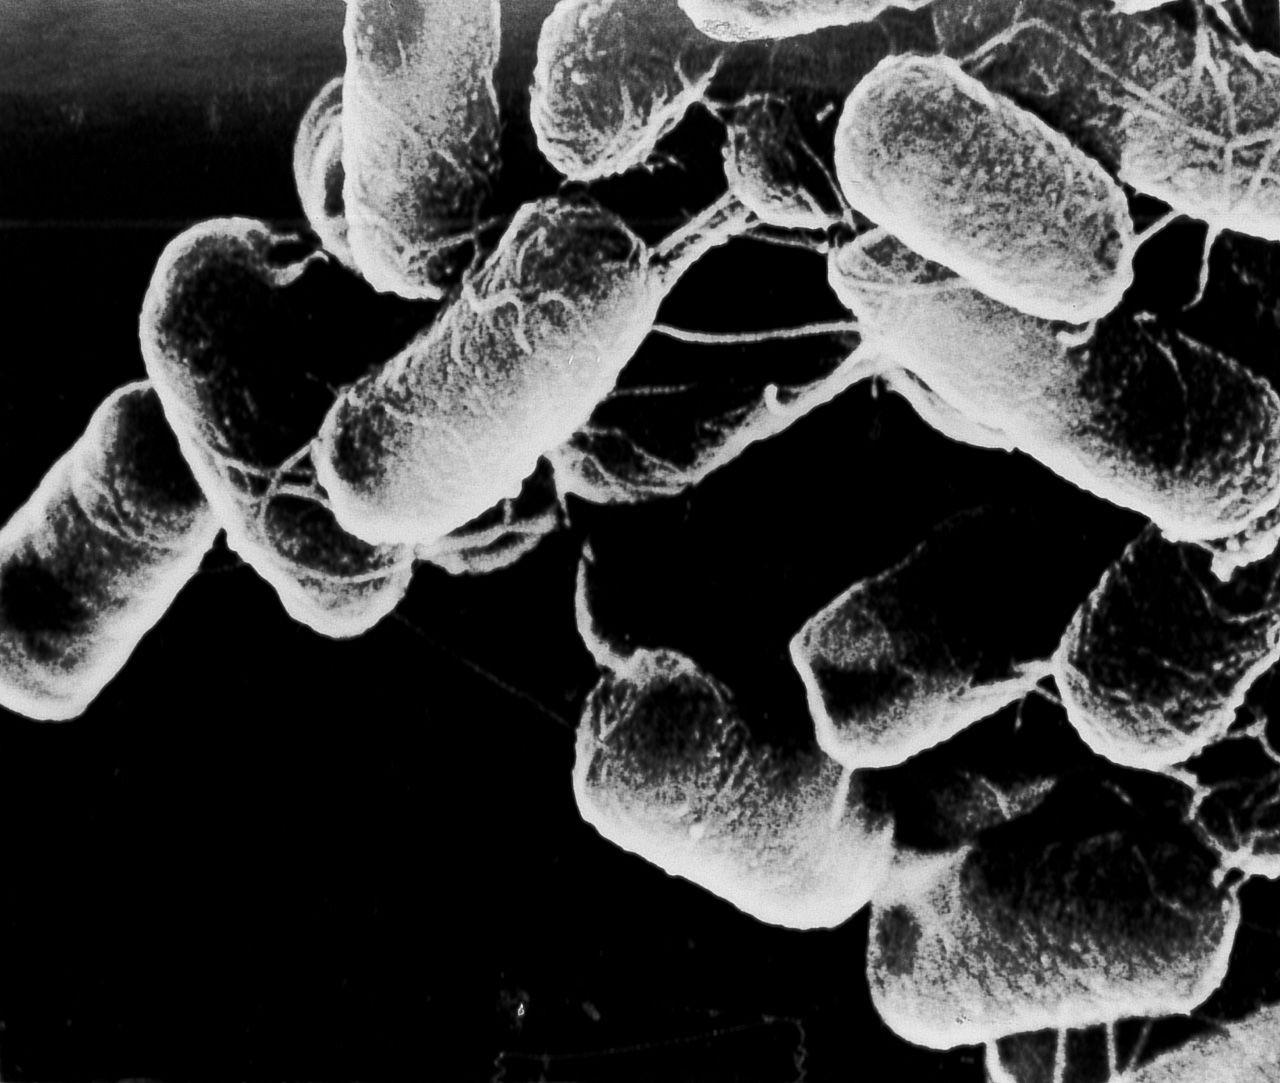 Bacillus subtilis nattō, le micro-organisme qui transforme le soja cuit à la vapeur en nattō. © Koizumi Takeo